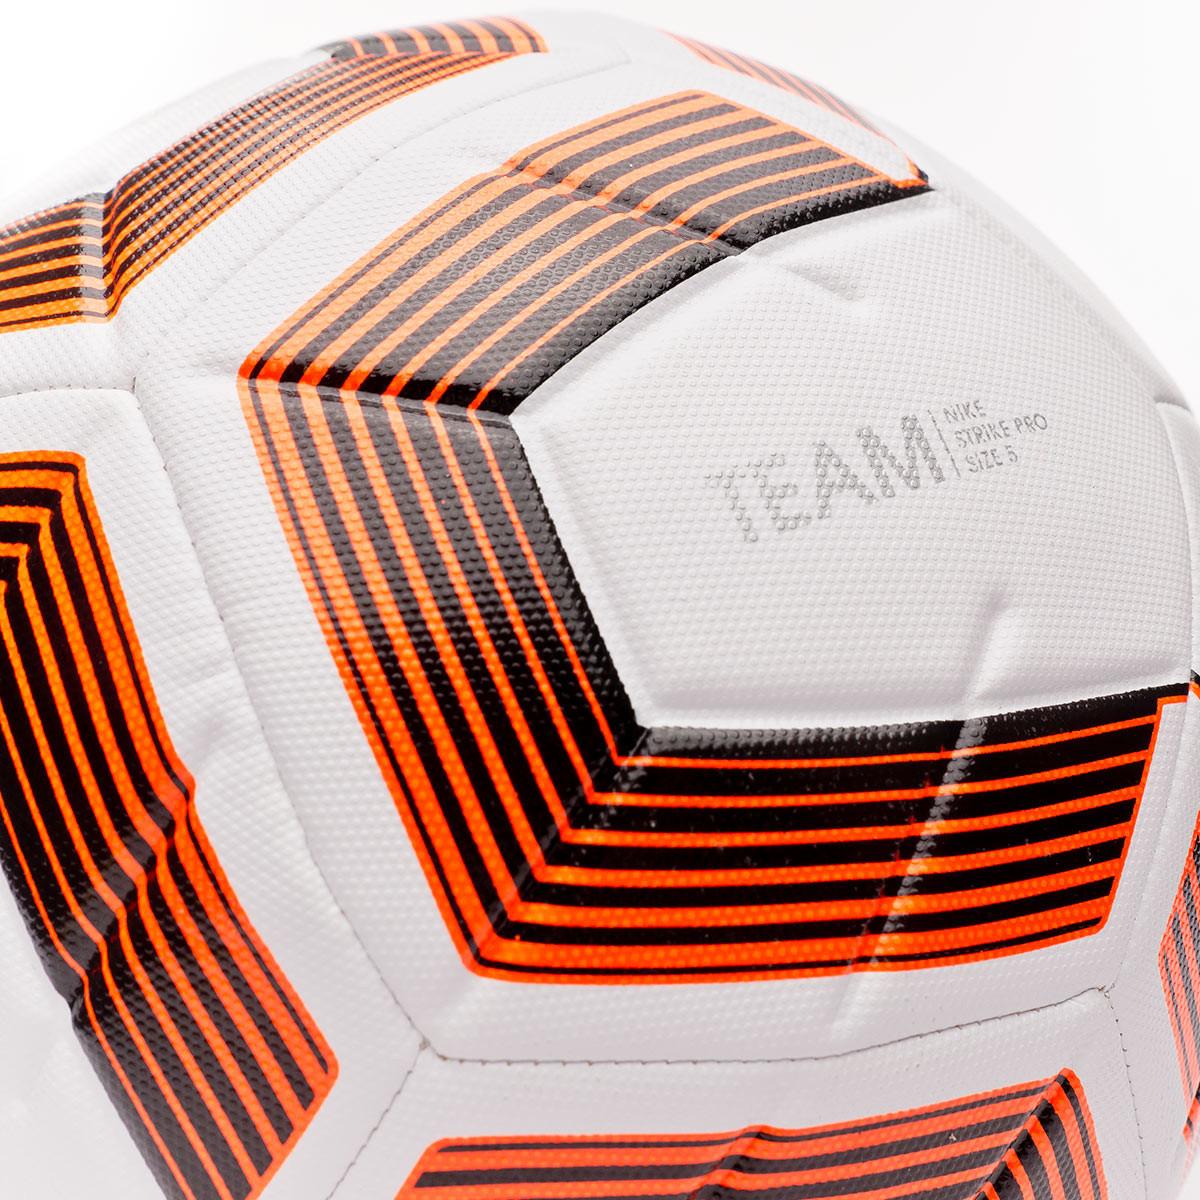 Hizo un contrato Confusión Maestría  Ball Nike Strike Pro Team White-Black-Total orange - Football store Fútbol  Emotion